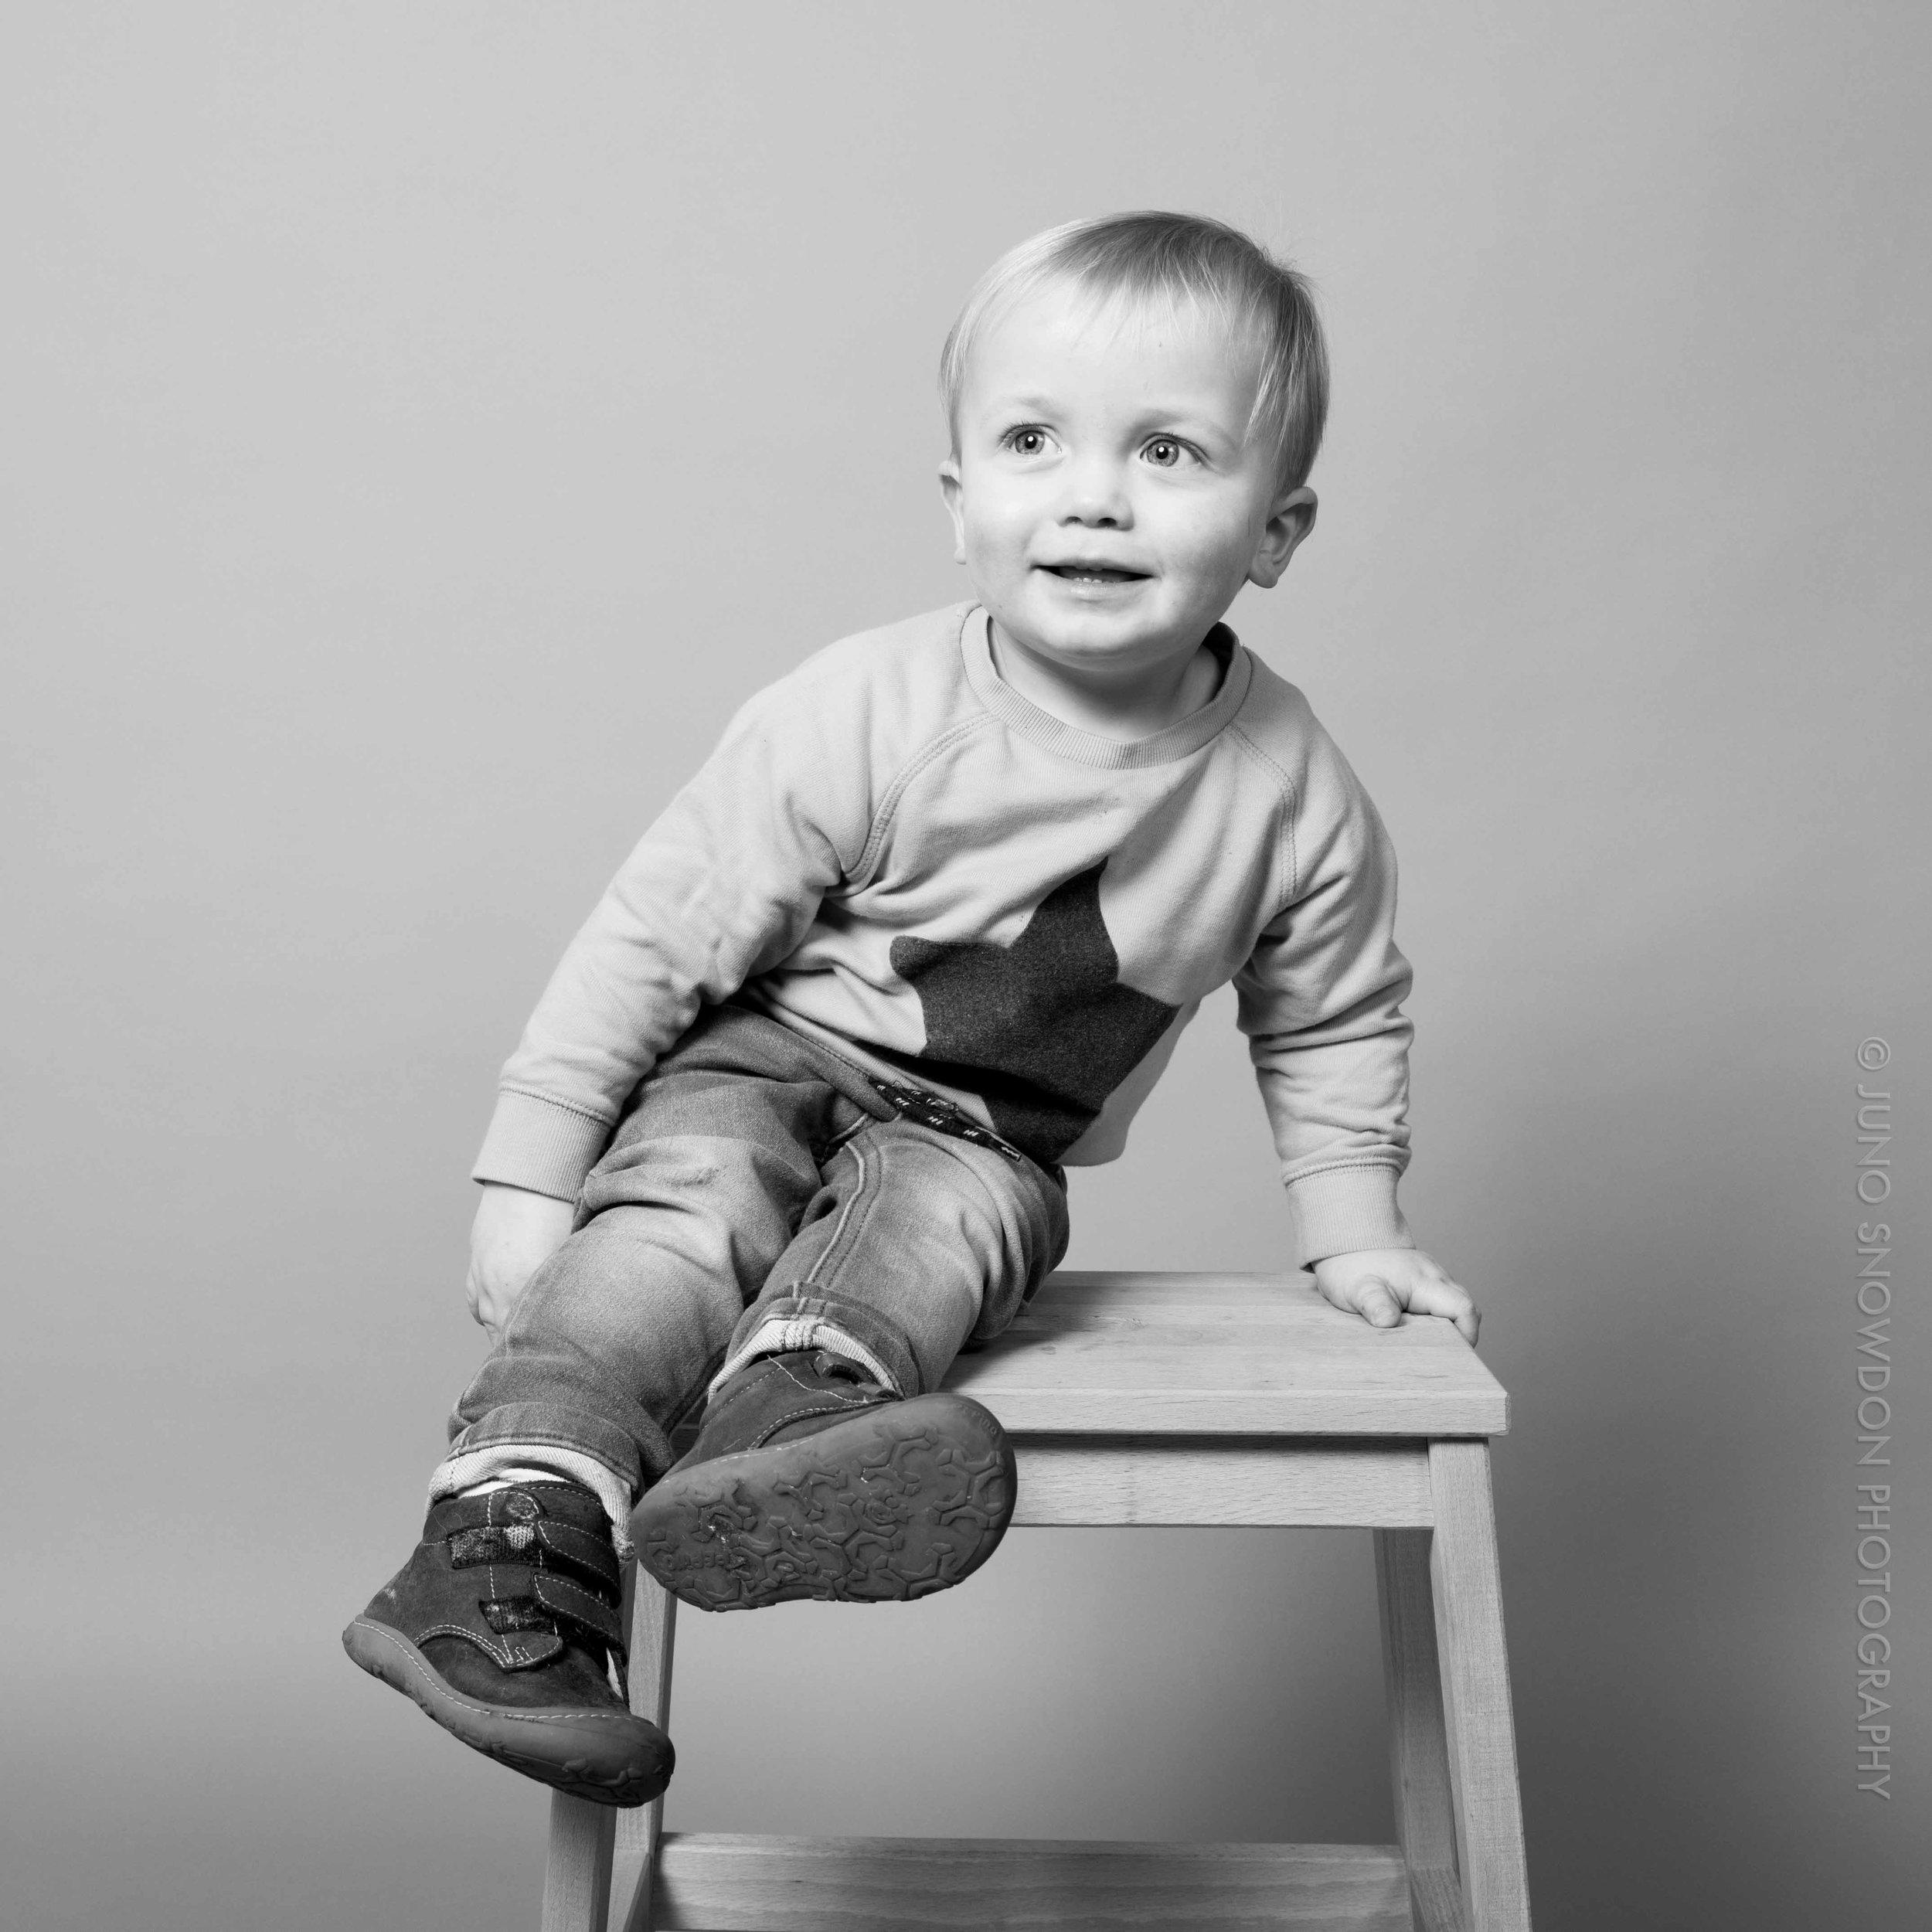 juno-snowdon-photography-family-portrait-9840.jpg